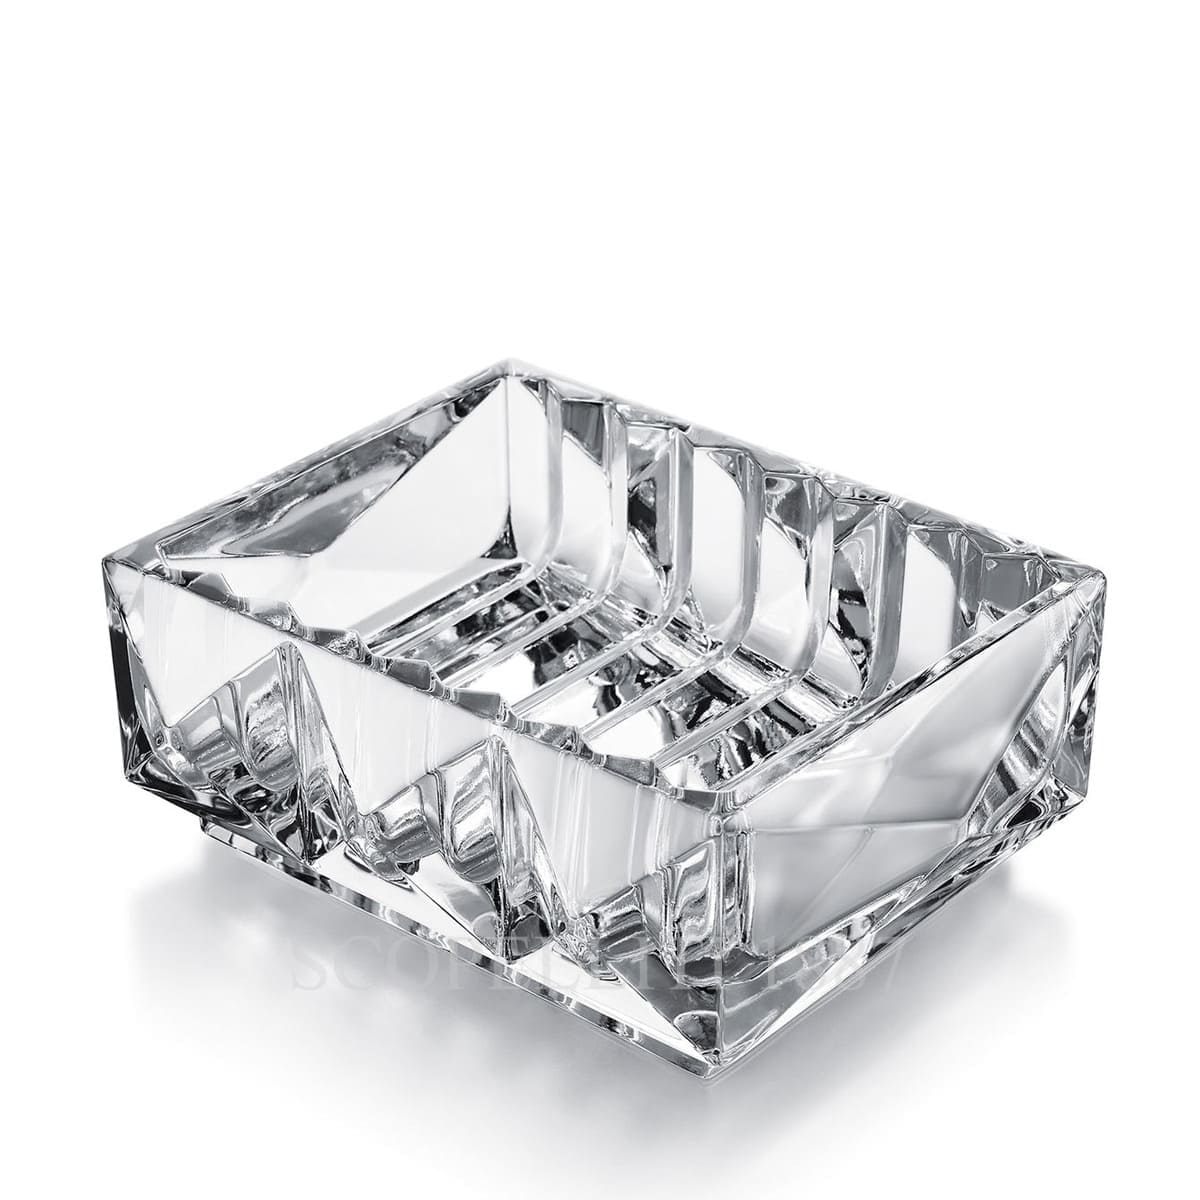 baccarat crystal french design louxor vide poche